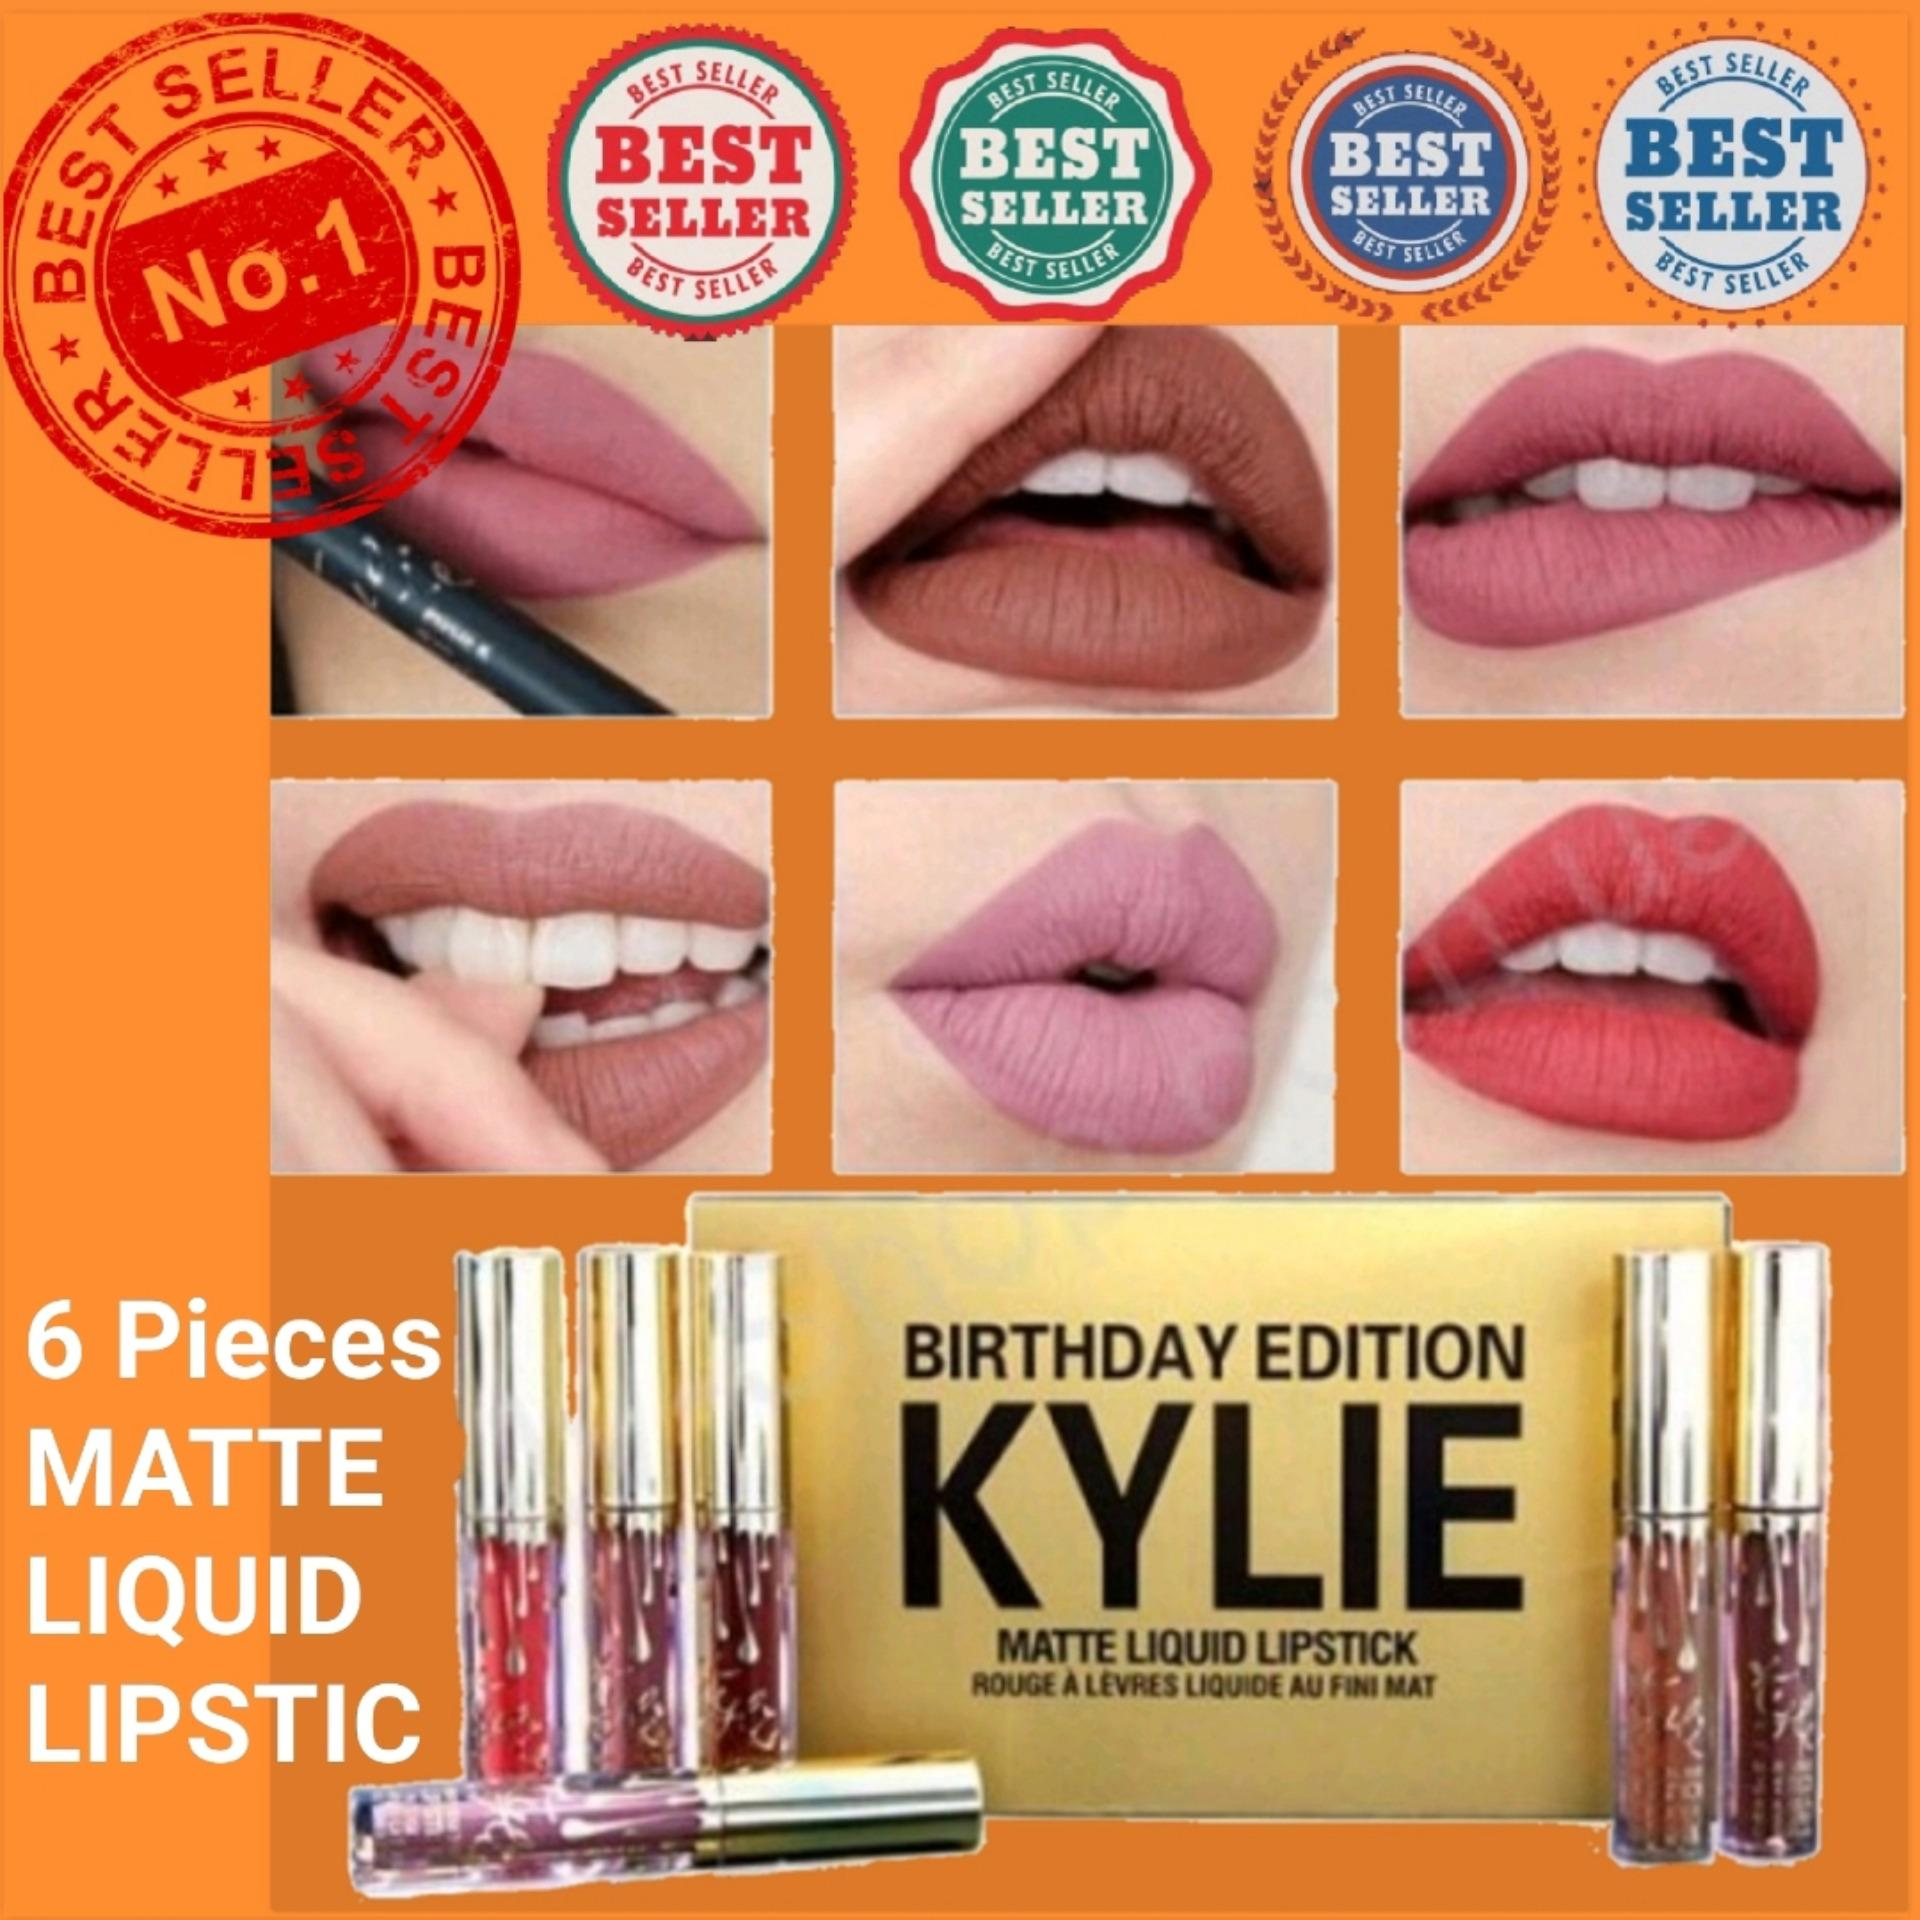 6pcs Kylie Matte Liquid Lipstick